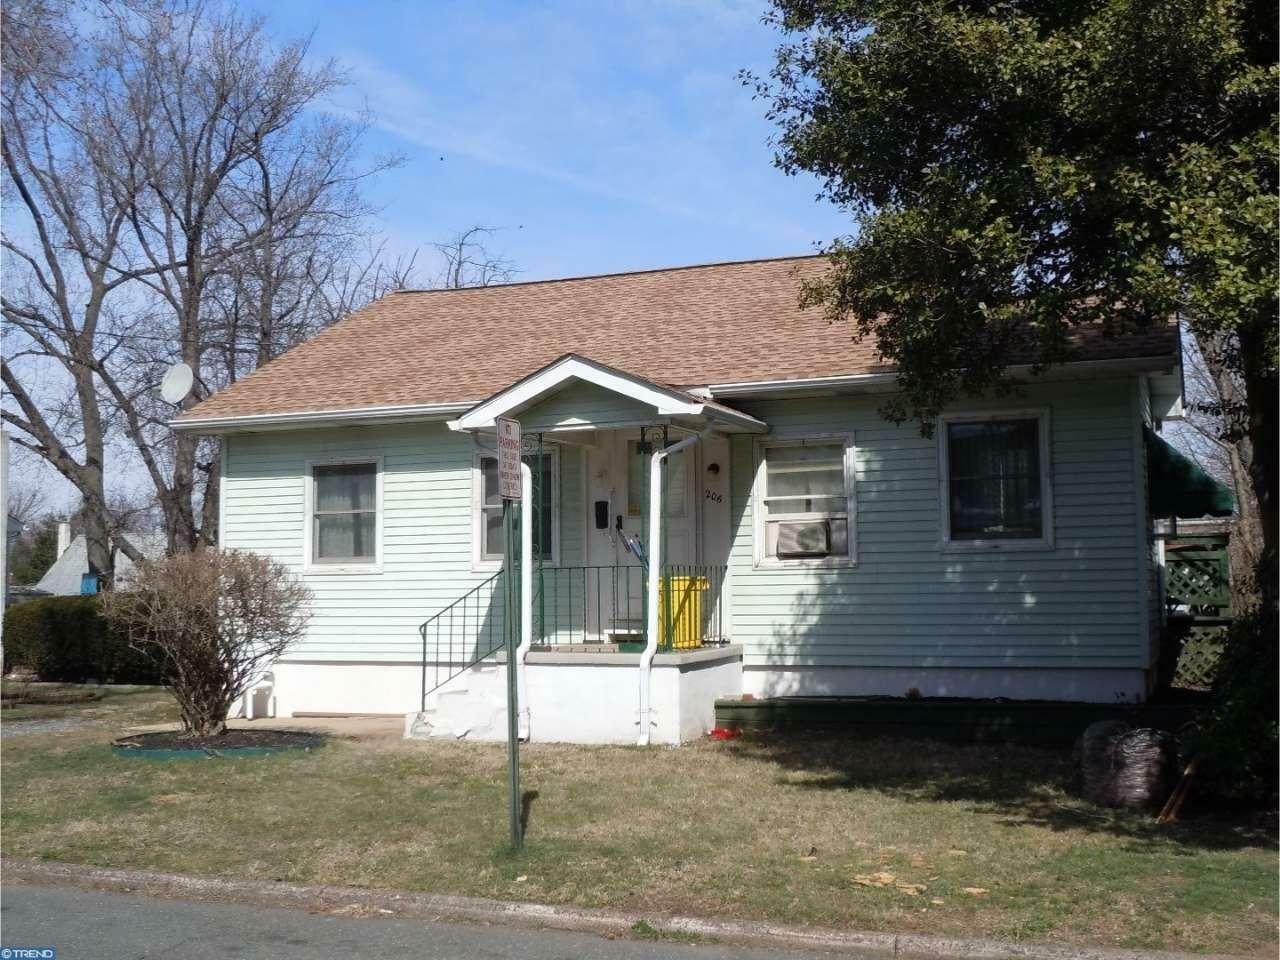 206 Brookside Ave, Ewing Twp, NJ - USA (photo 1)